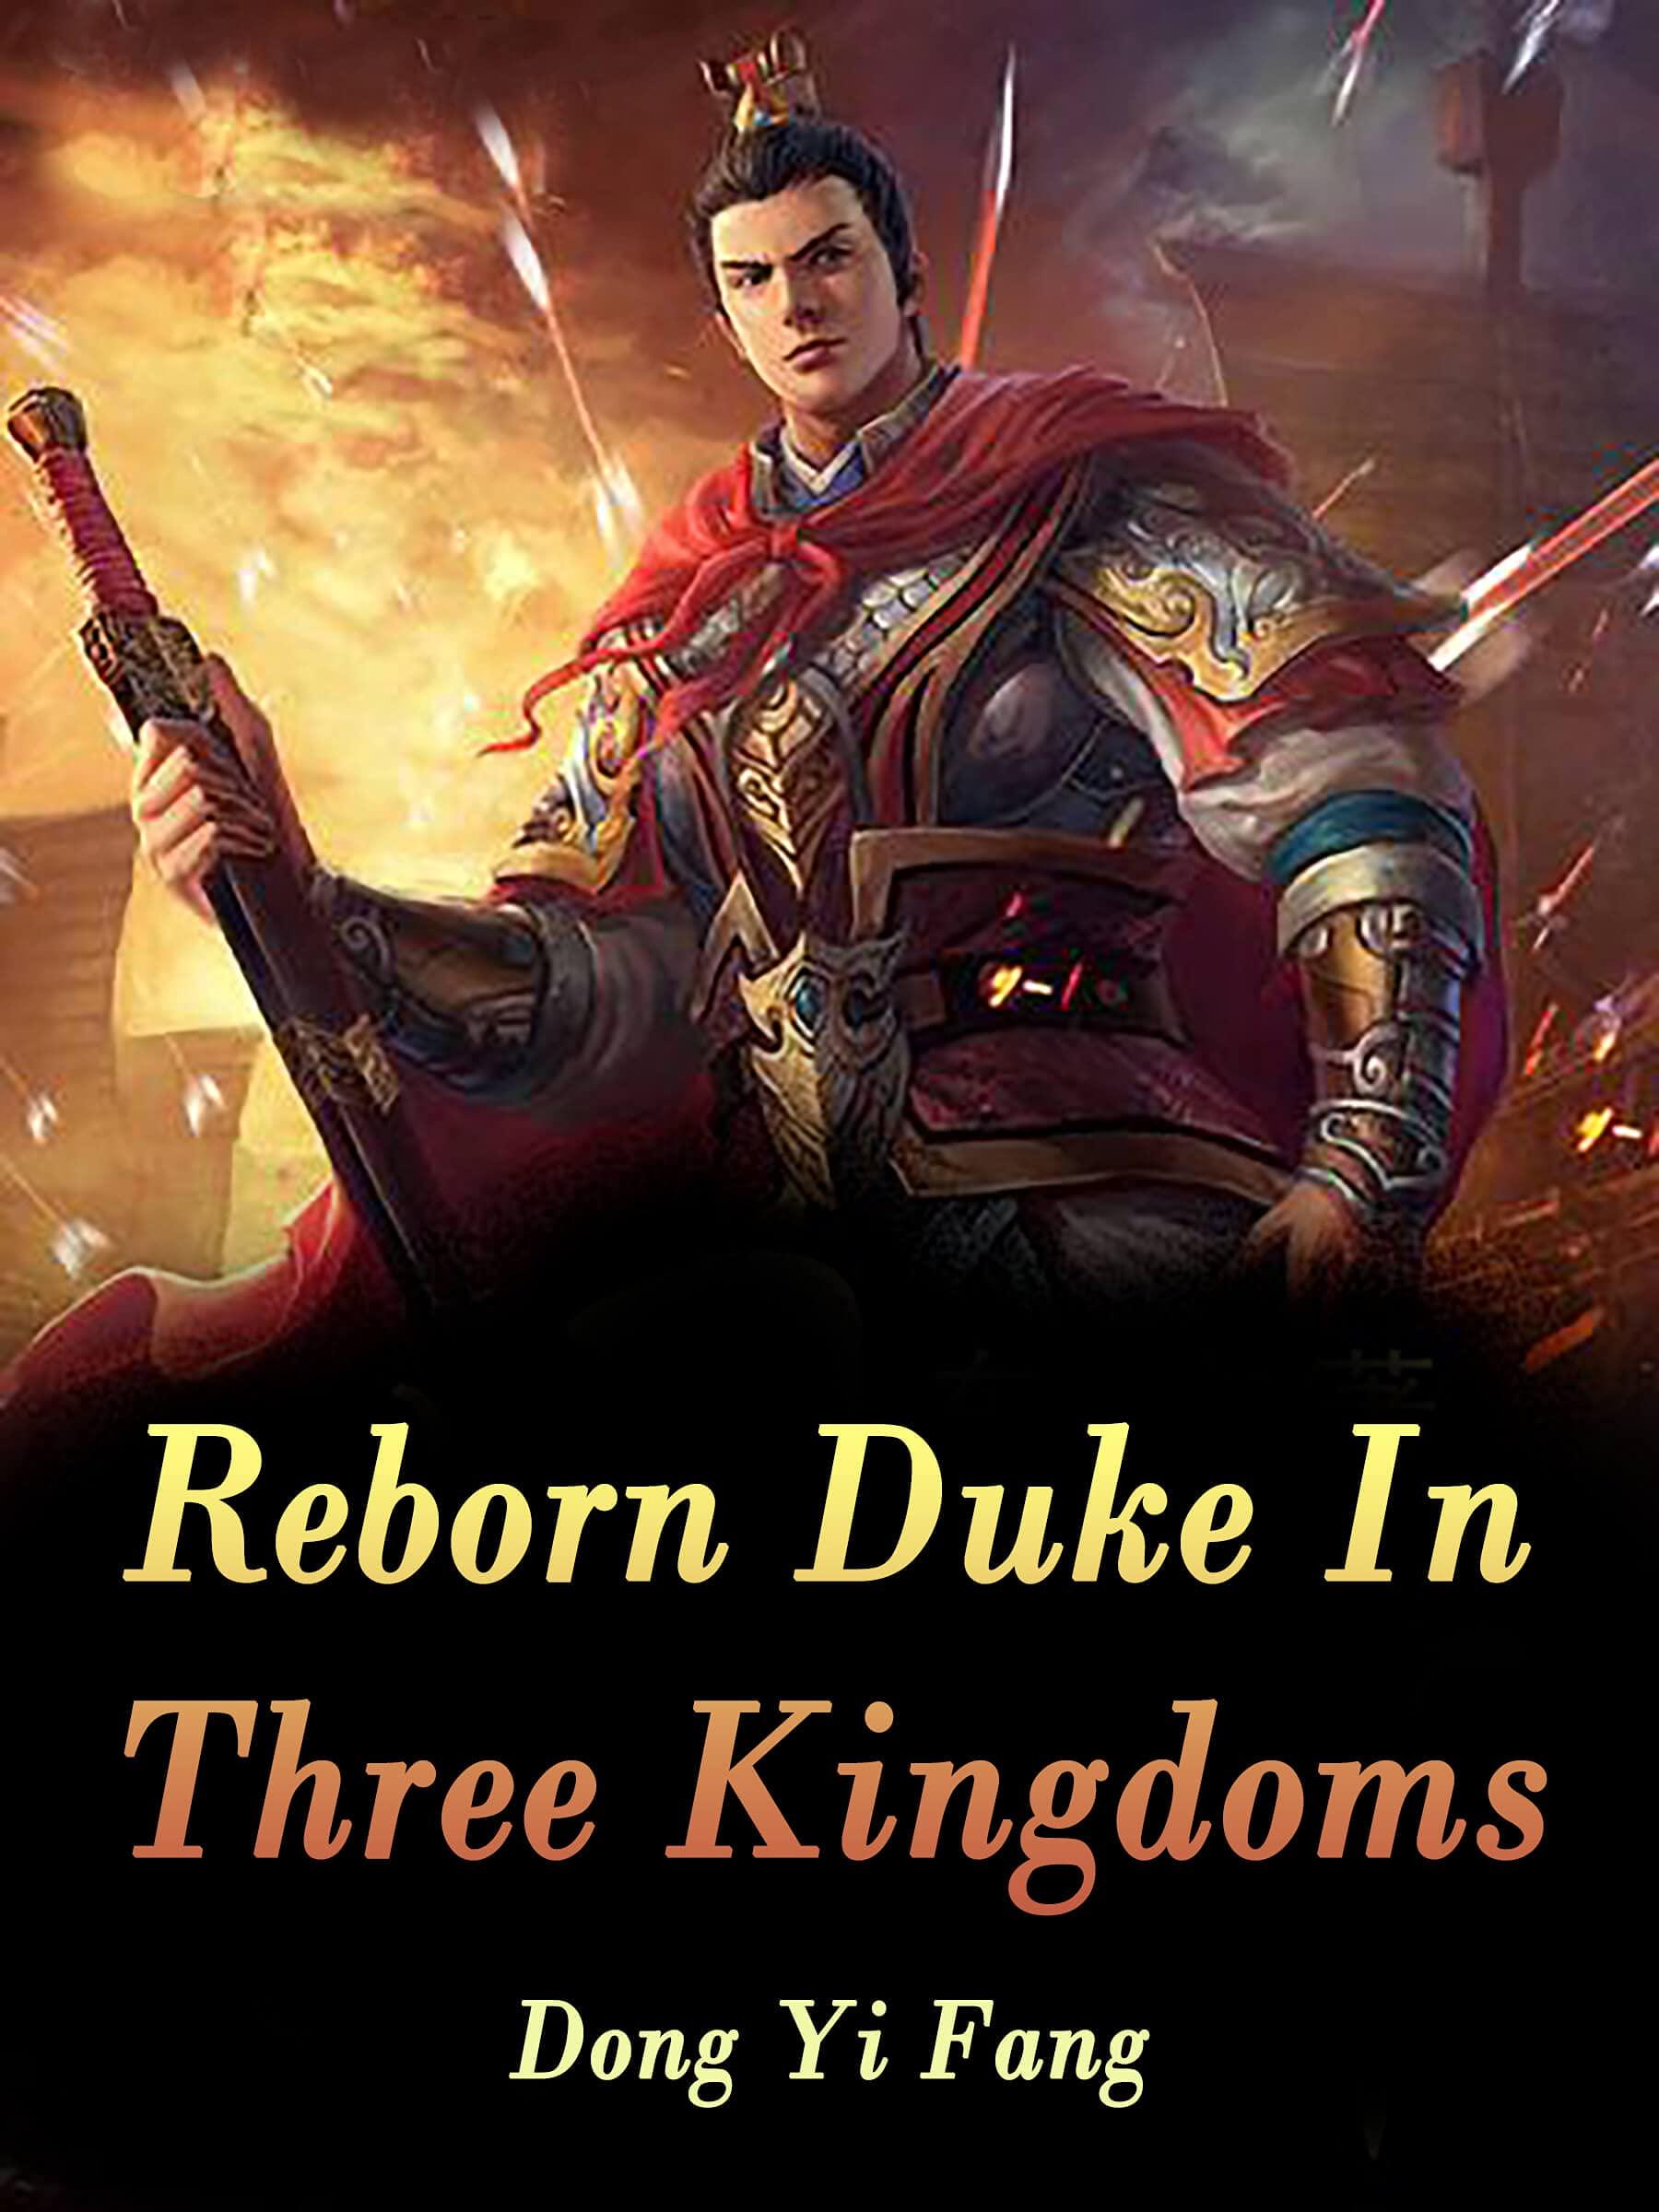 Reborn Duke In Three Kingdoms: A reborn historical fiction books ( fight strategy, genius heroine romance, sword fighting set, army novels for teens ) Book 1